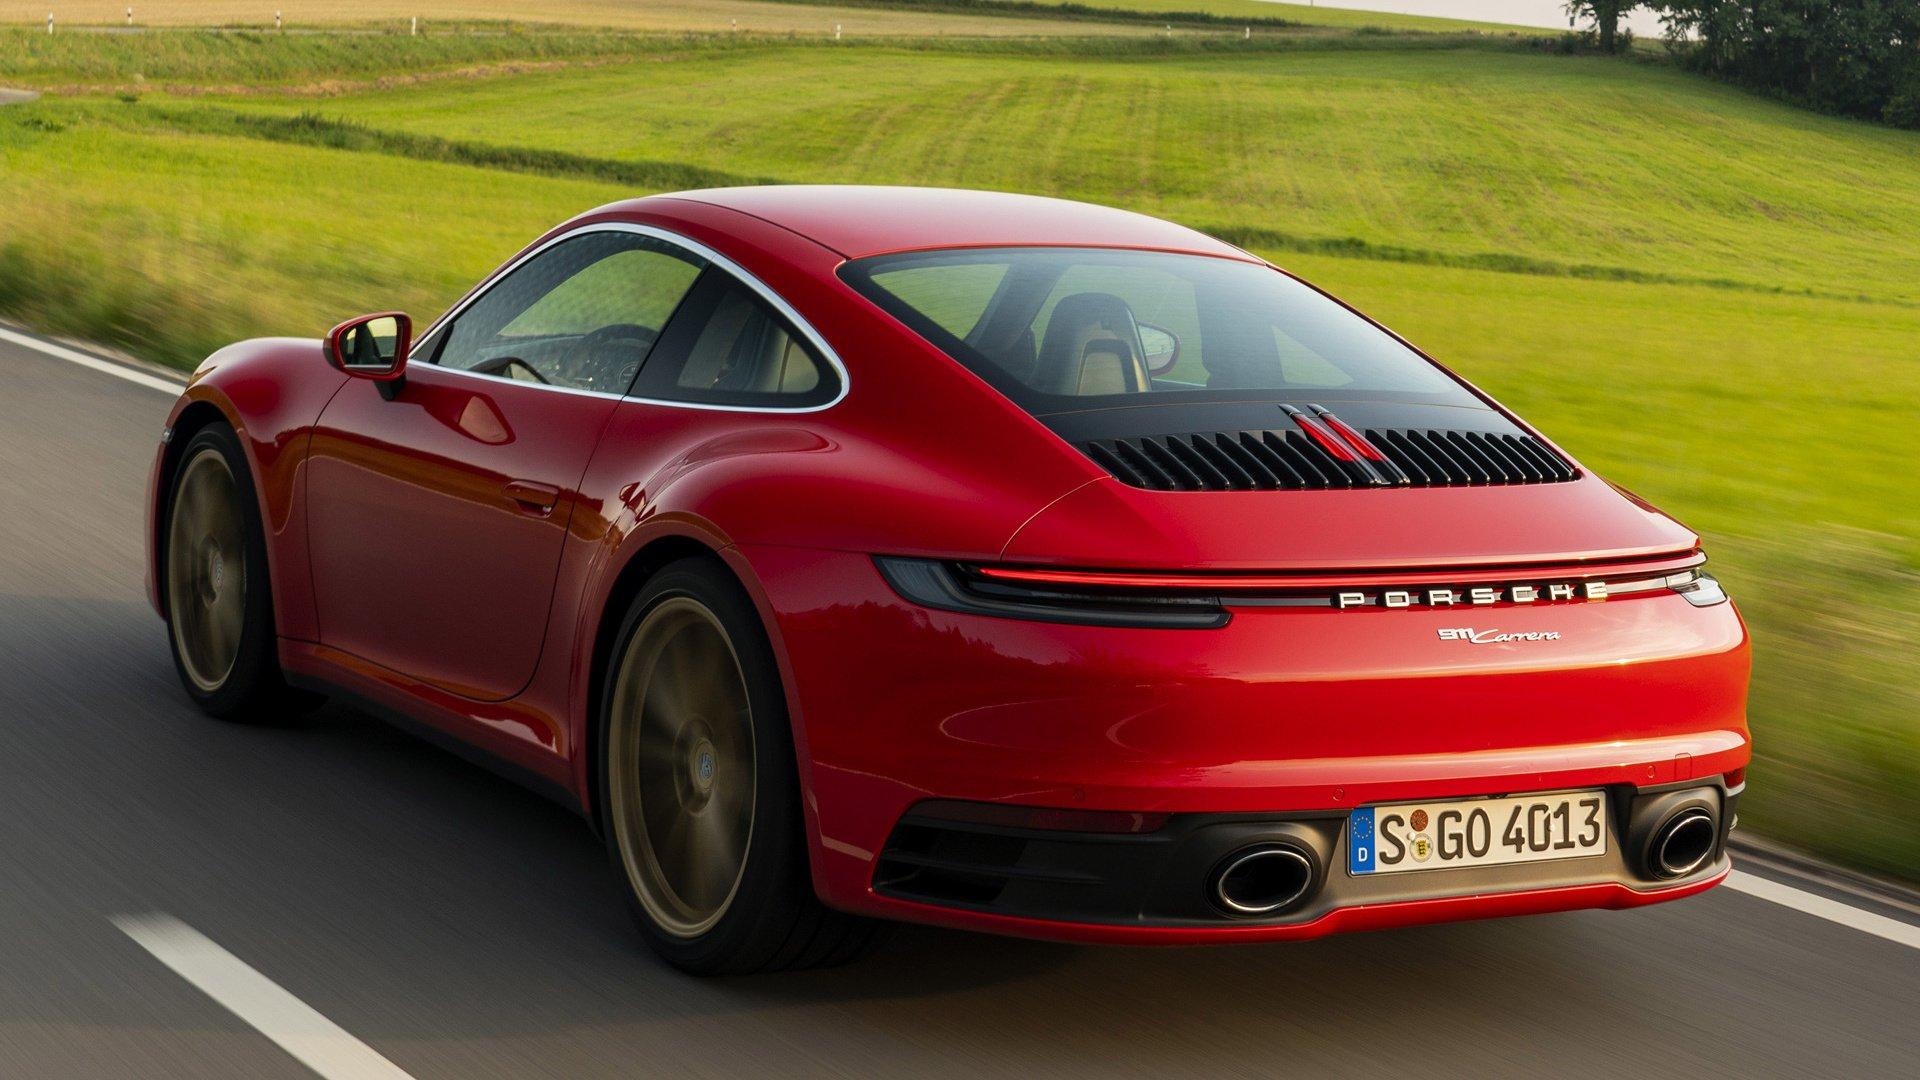 2019 Porsche 911 992 Carrera Papel De Parede Hd Plano De Fundo 1920x1080 Id 1039544 Wallpaper Abyss